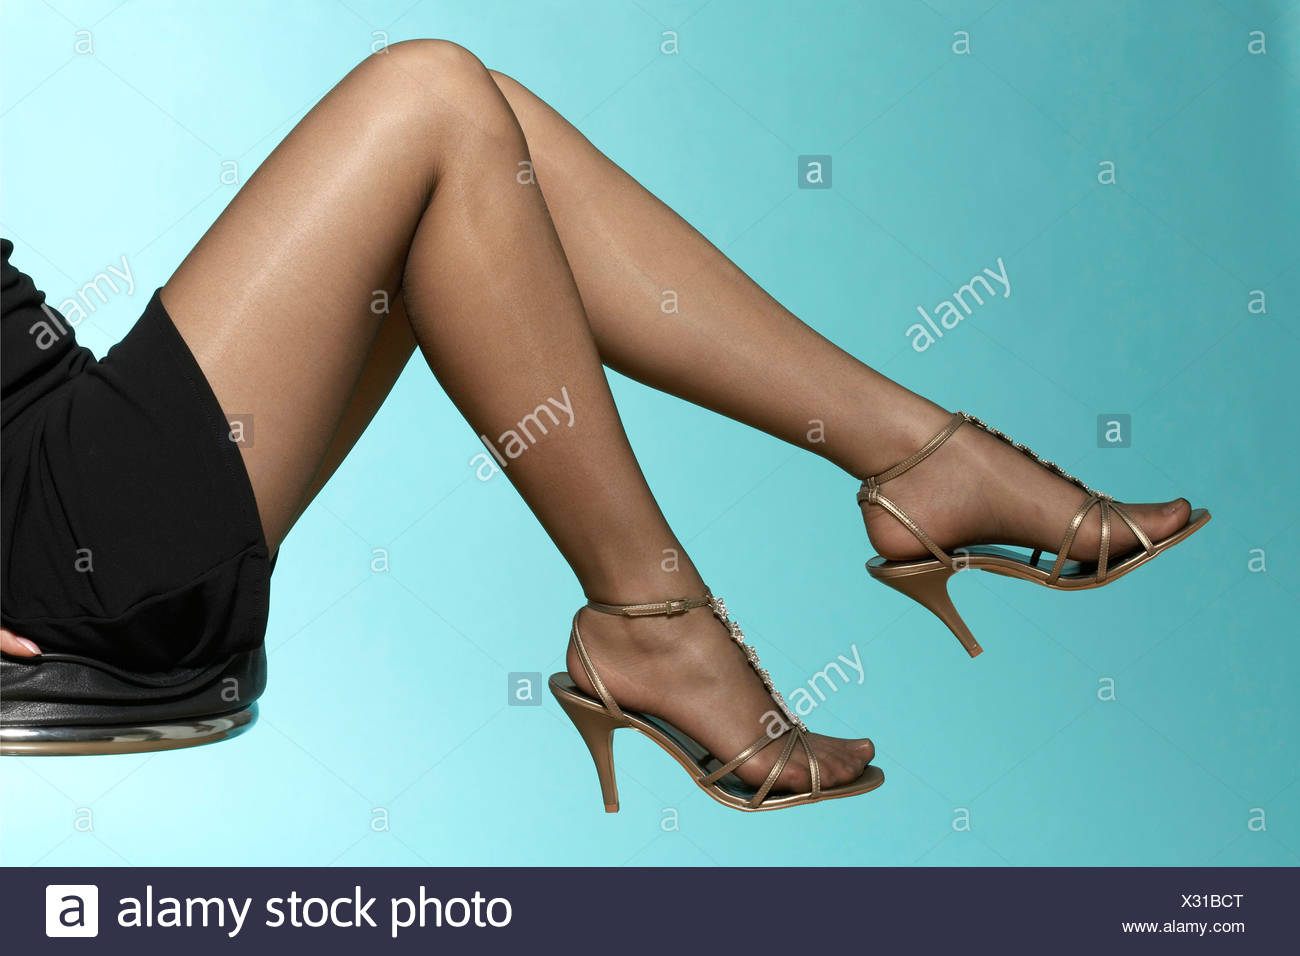 Feet Michaela Mendez nude (73 foto and video), Pussy, Bikini, Feet, underwear 2006